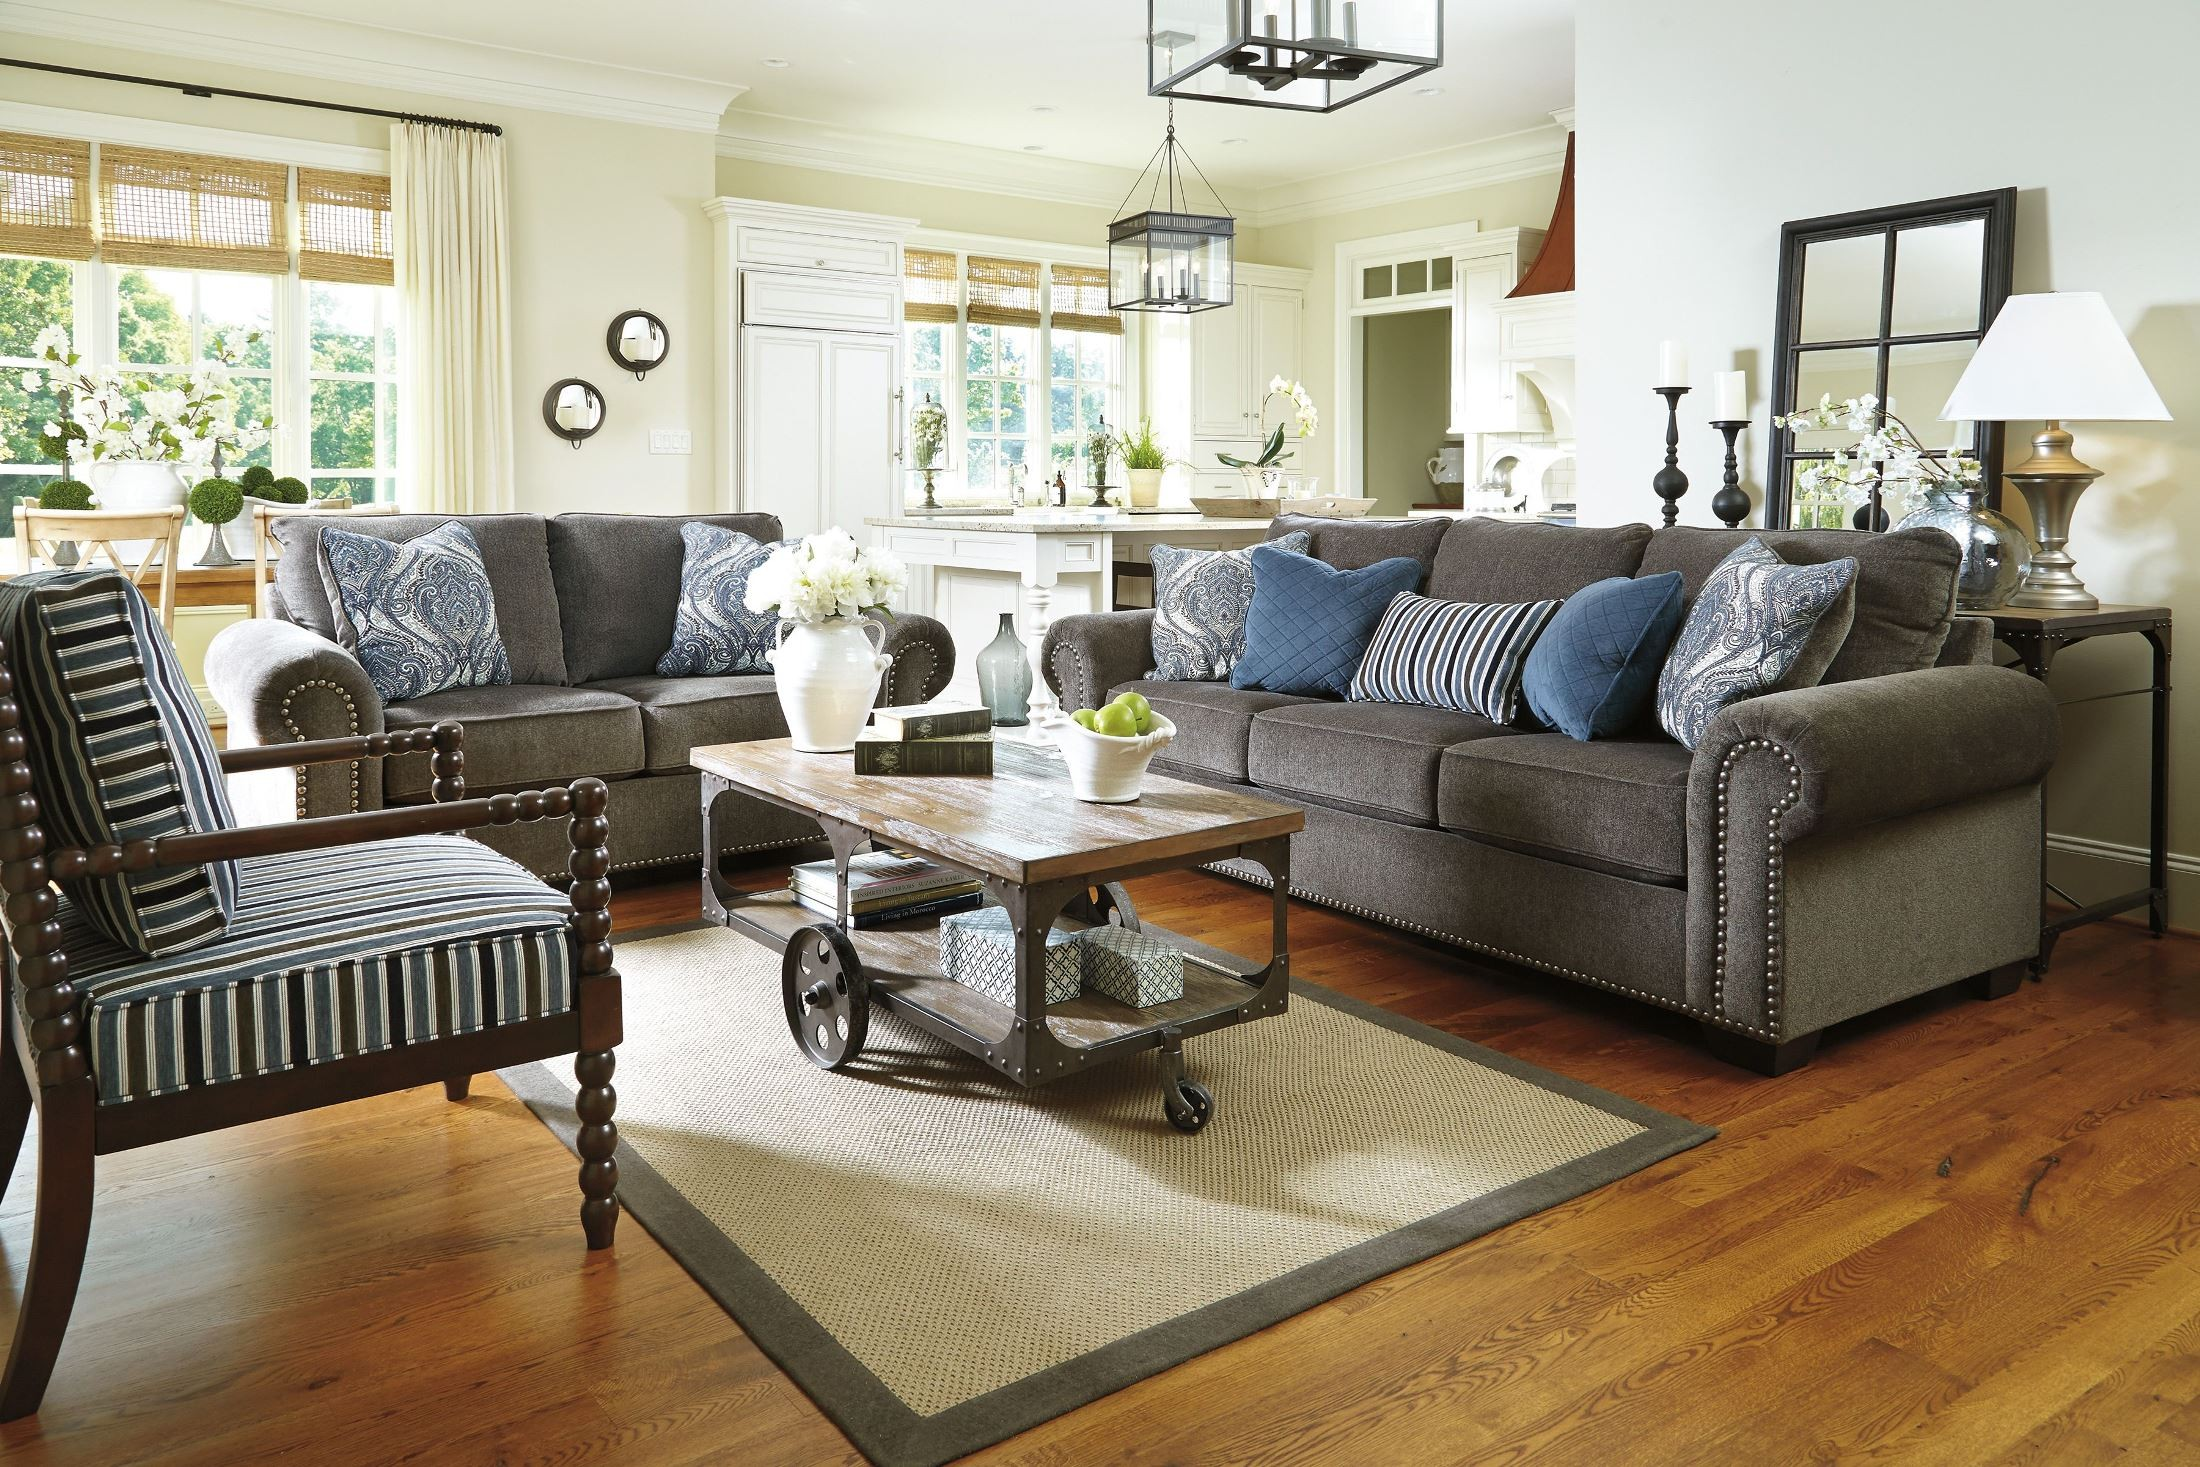 navasota charcoal sofa ashley furniture contoh desain l minimalis regal accent chair from 8700260